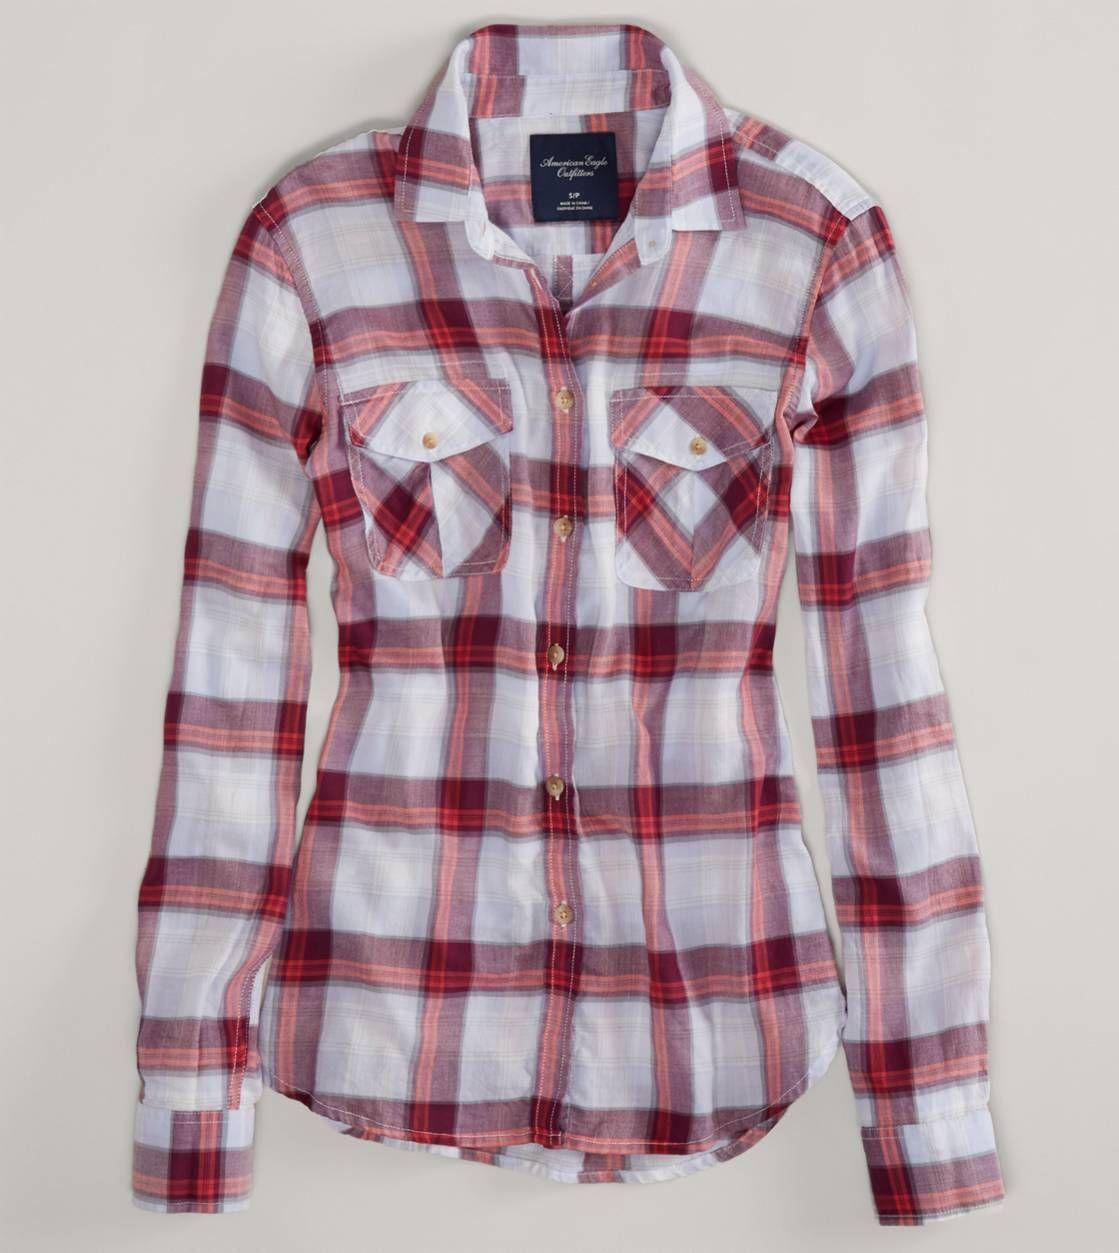 Hollister flannel shirts womens  AE Plaid Shirt  AE  Pinterest  Plaid Clothes and Dream closets